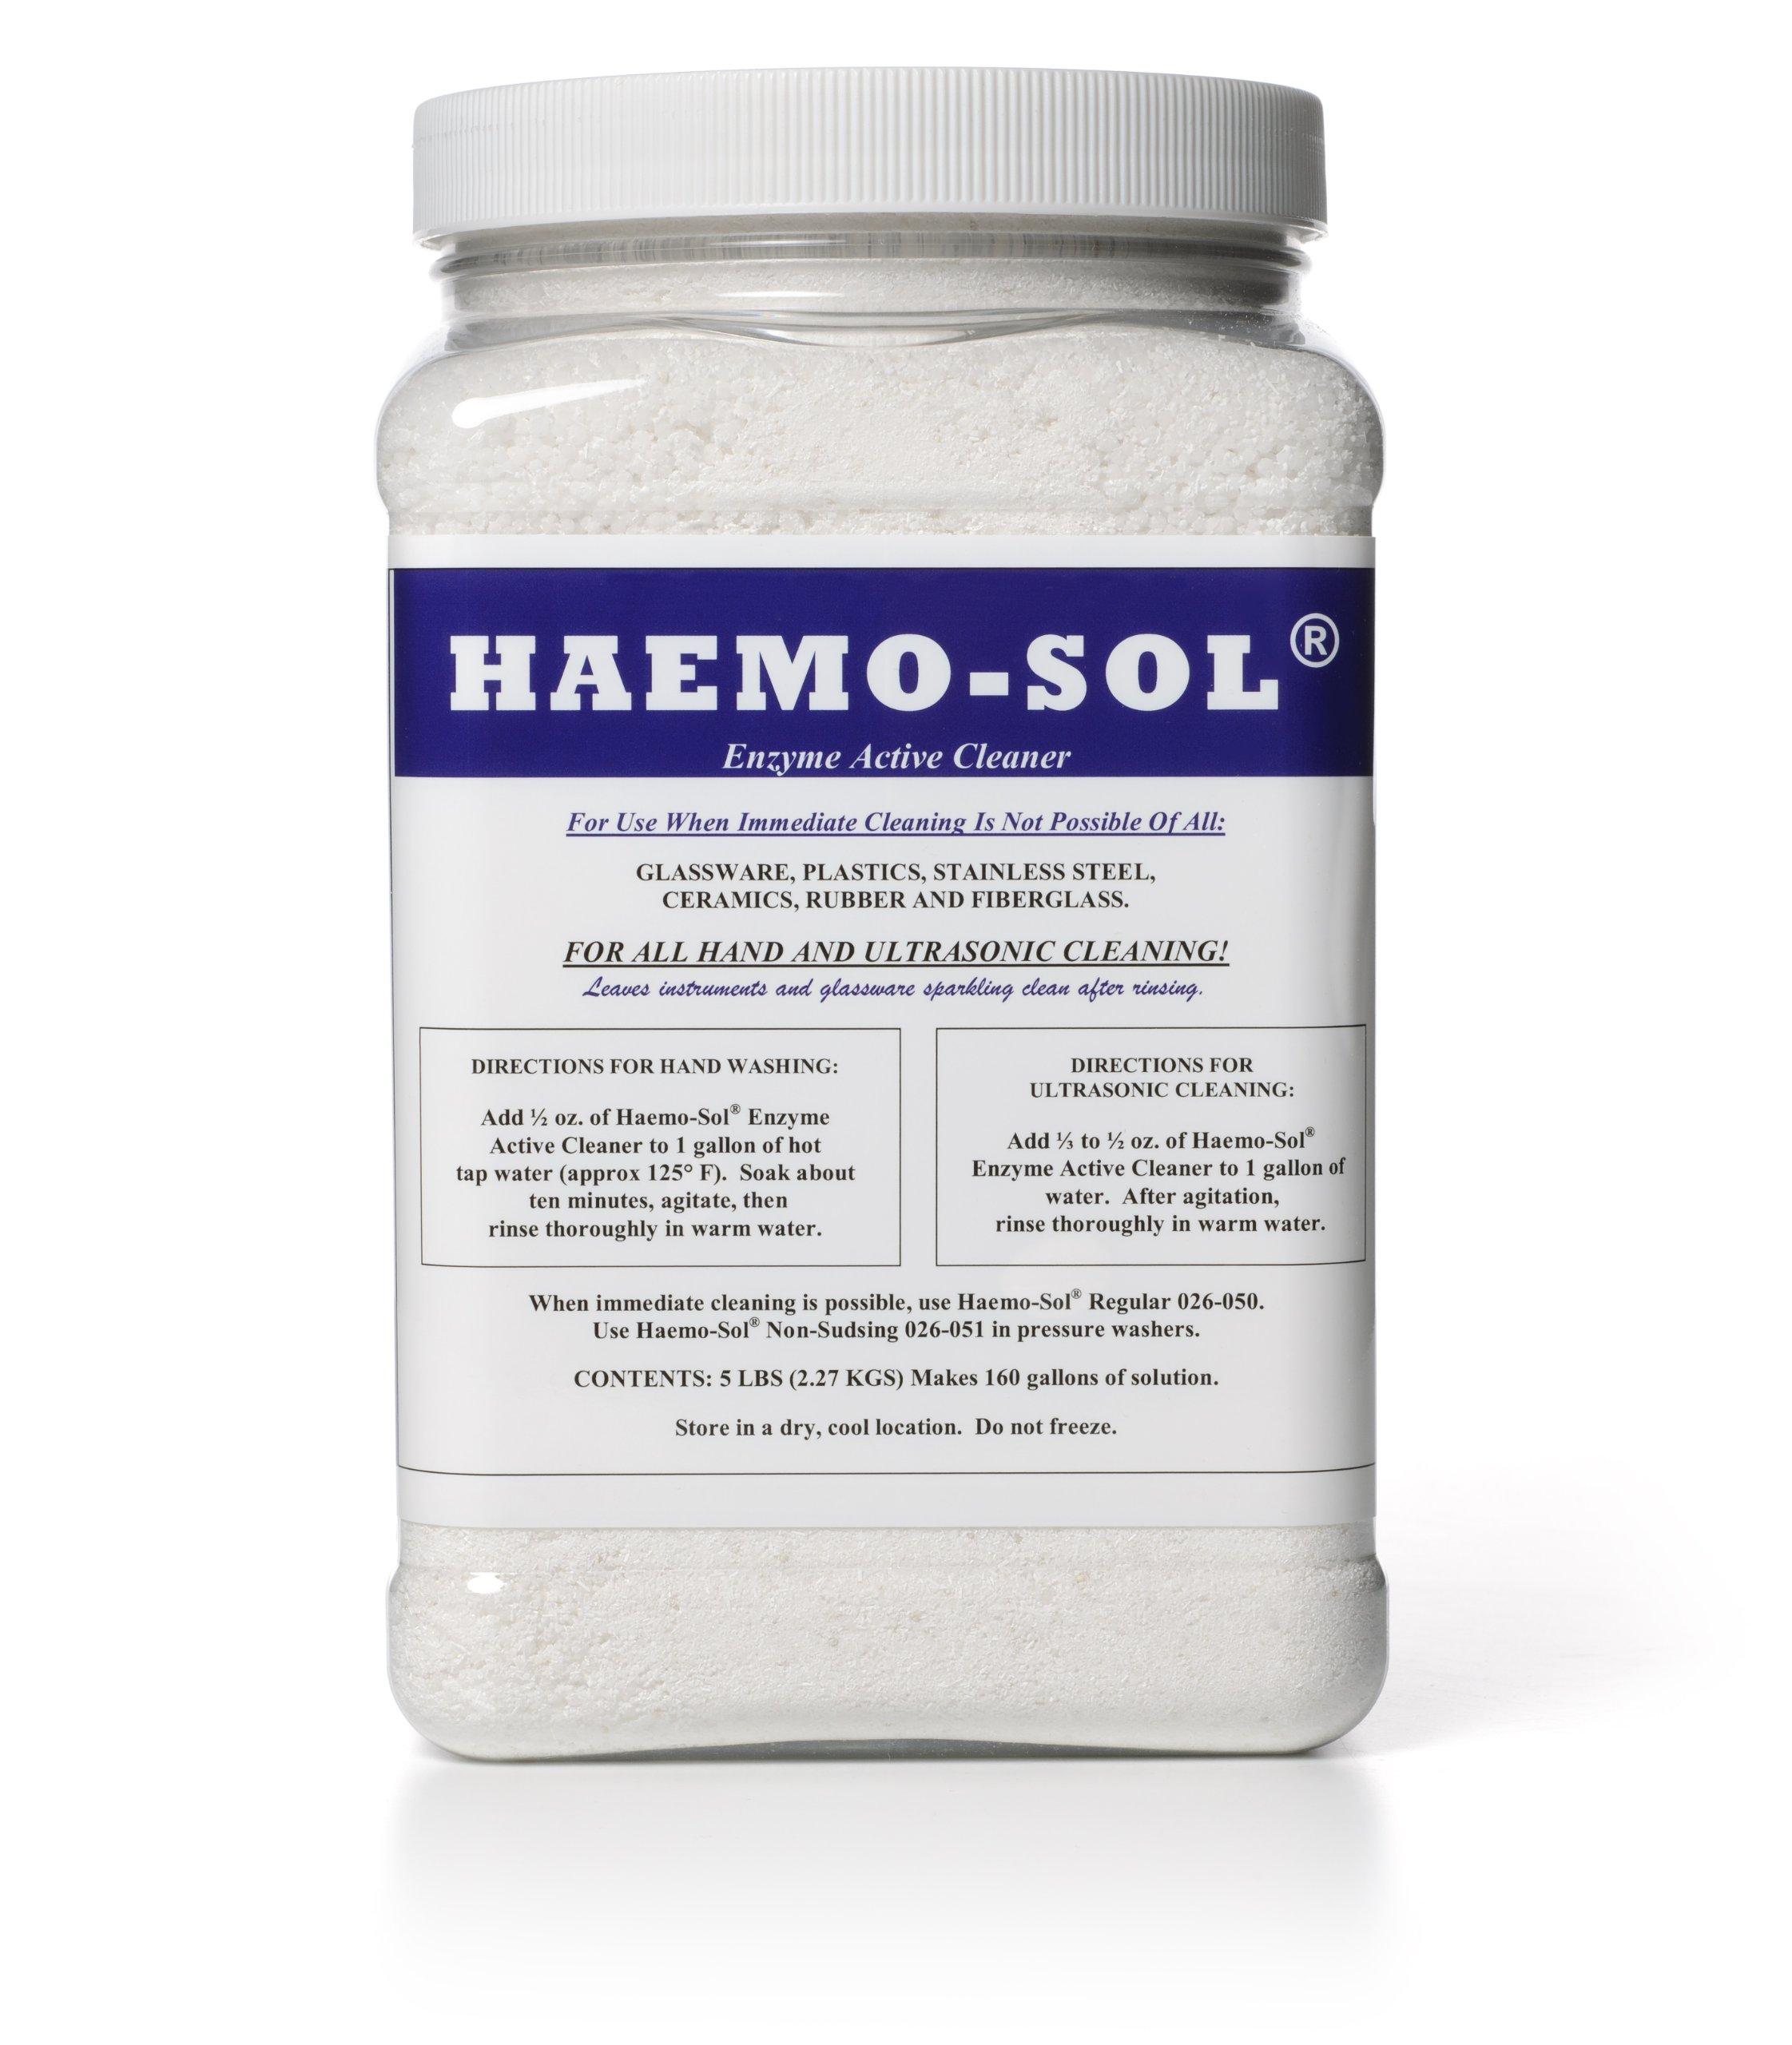 HAEMO-SOL 026-055CN Enzymatic Detergent, 5 lb by HAEMO-SOL